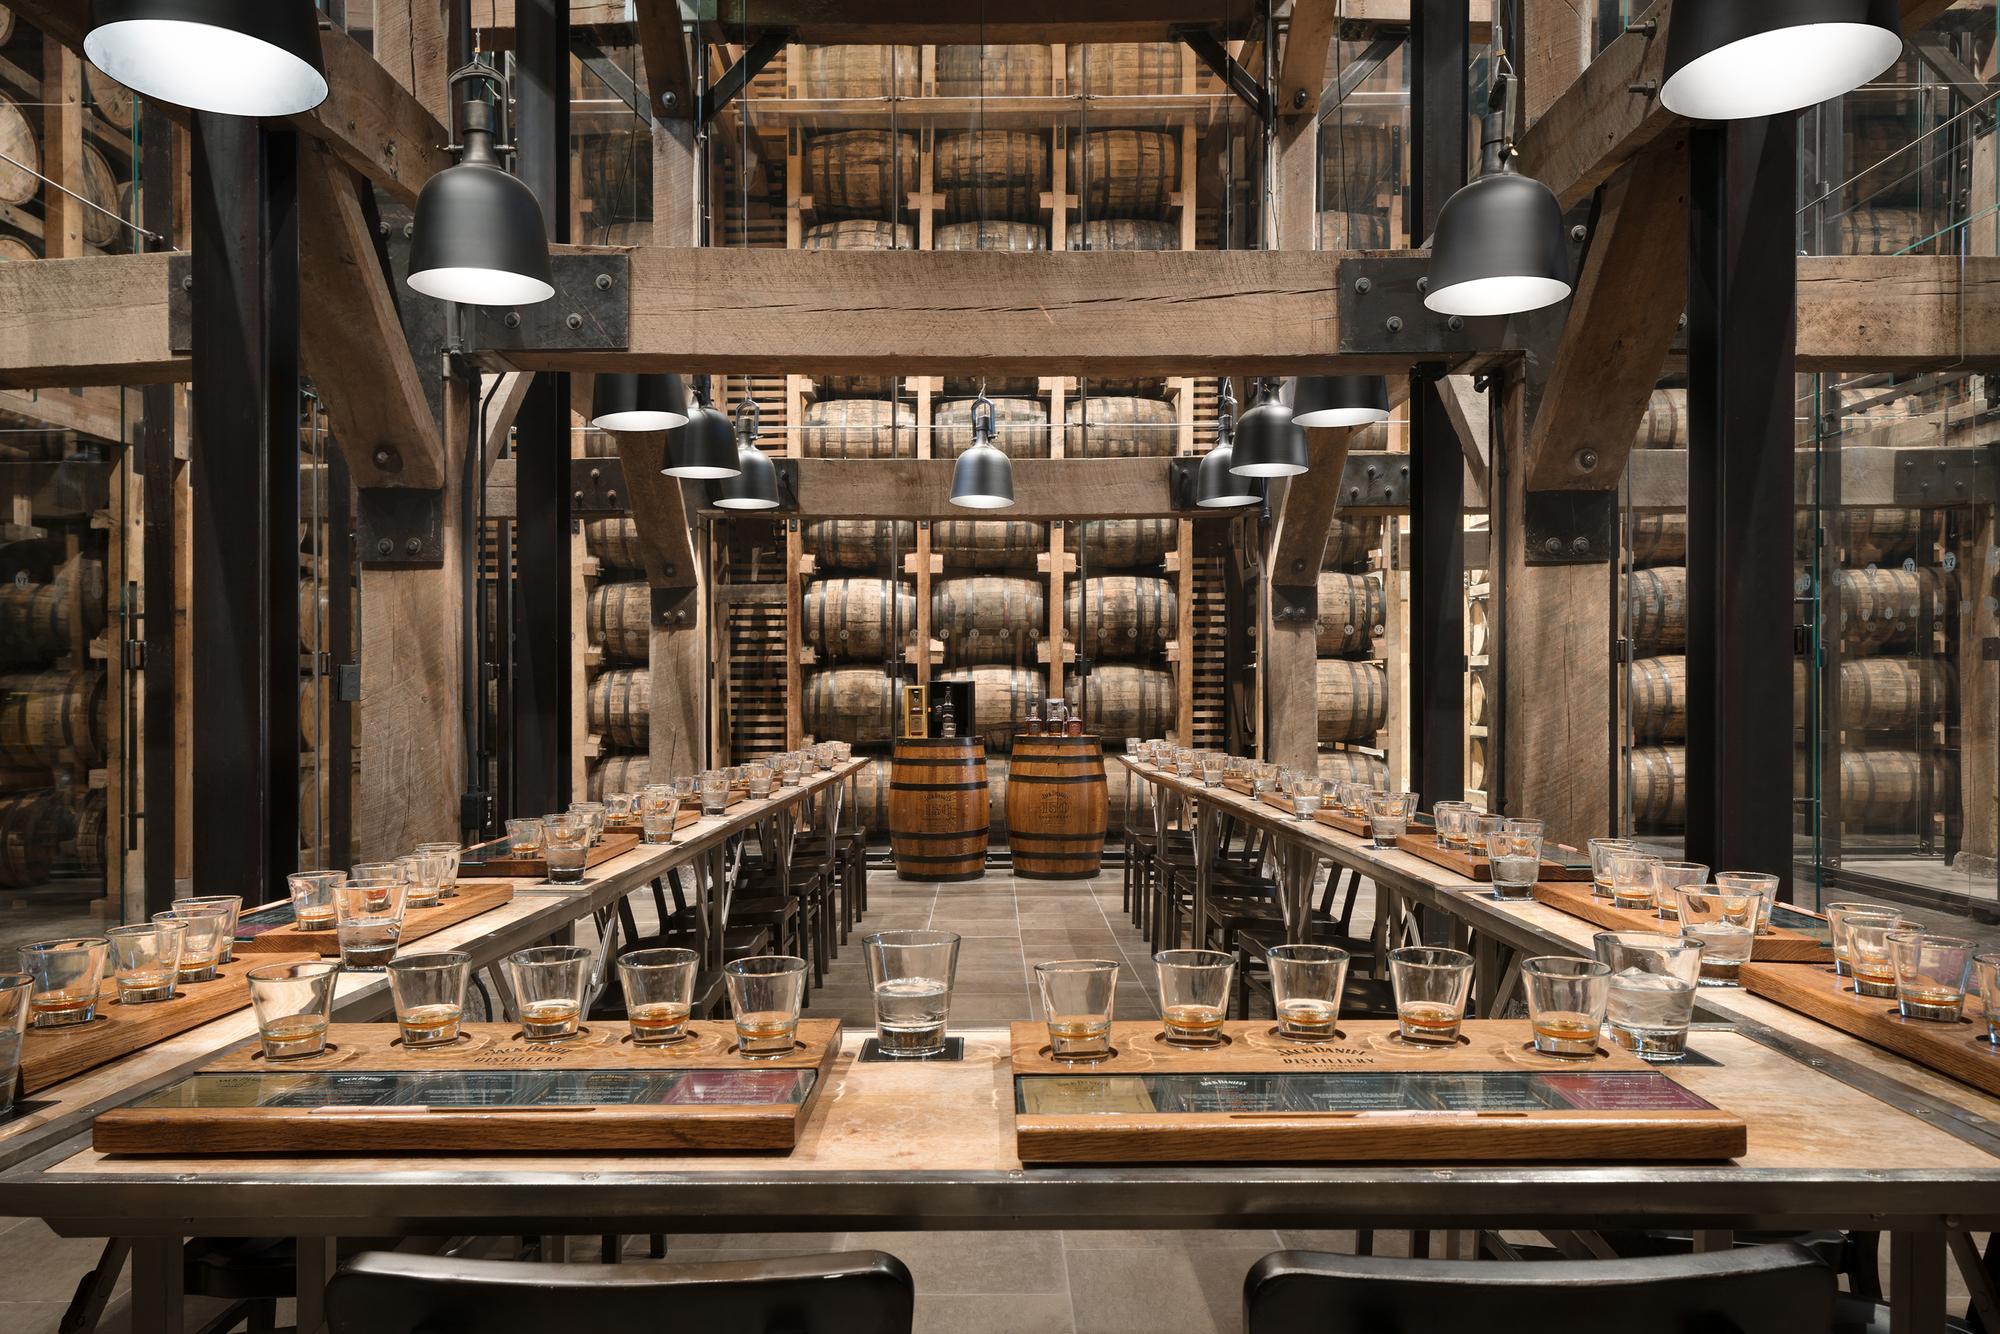 Tasting room in Jack Daniels renovated Distillery Barrel